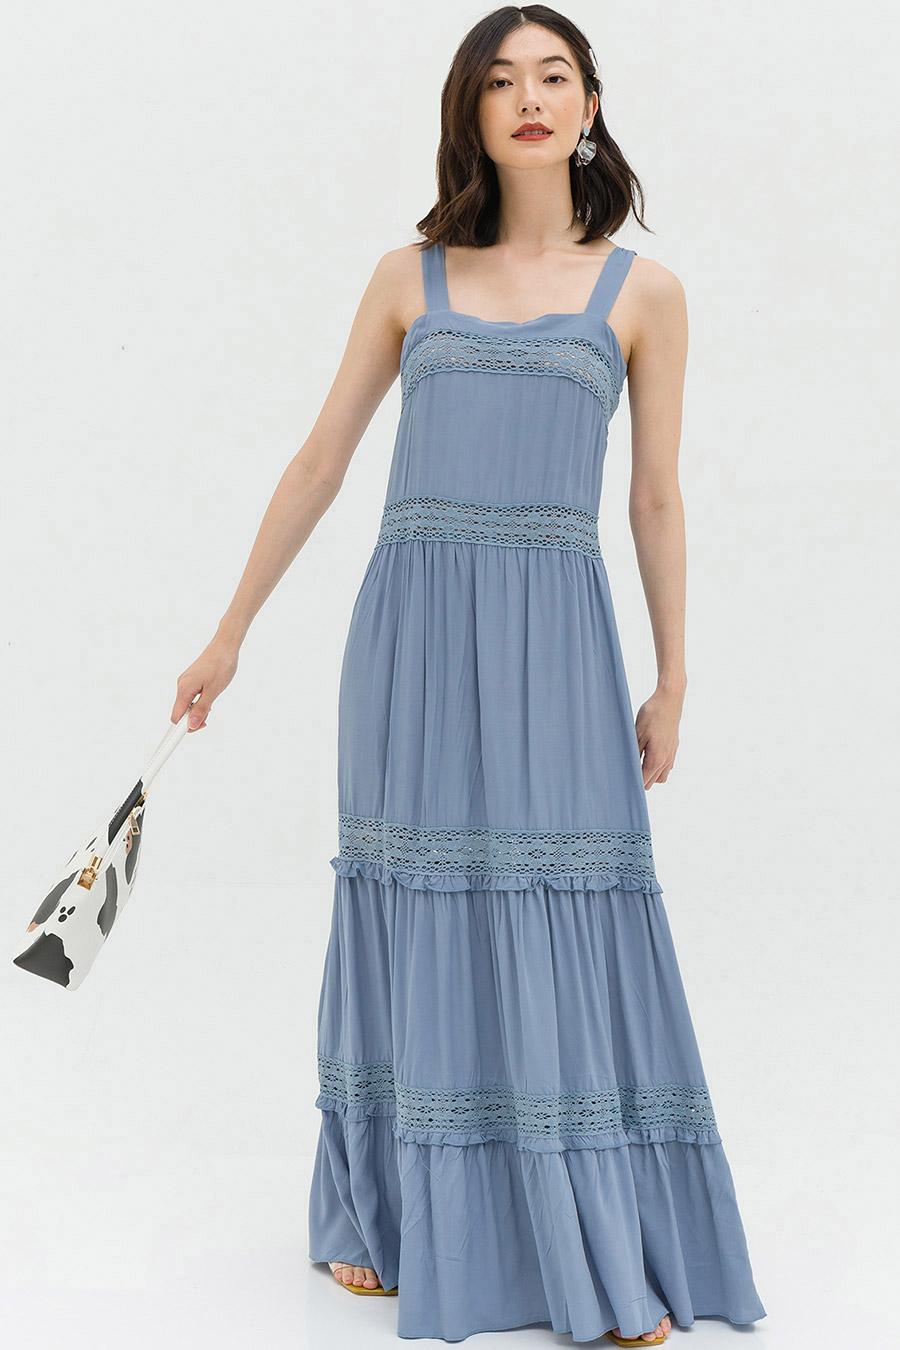 ARLETTE DRESS - CORNFLOWER